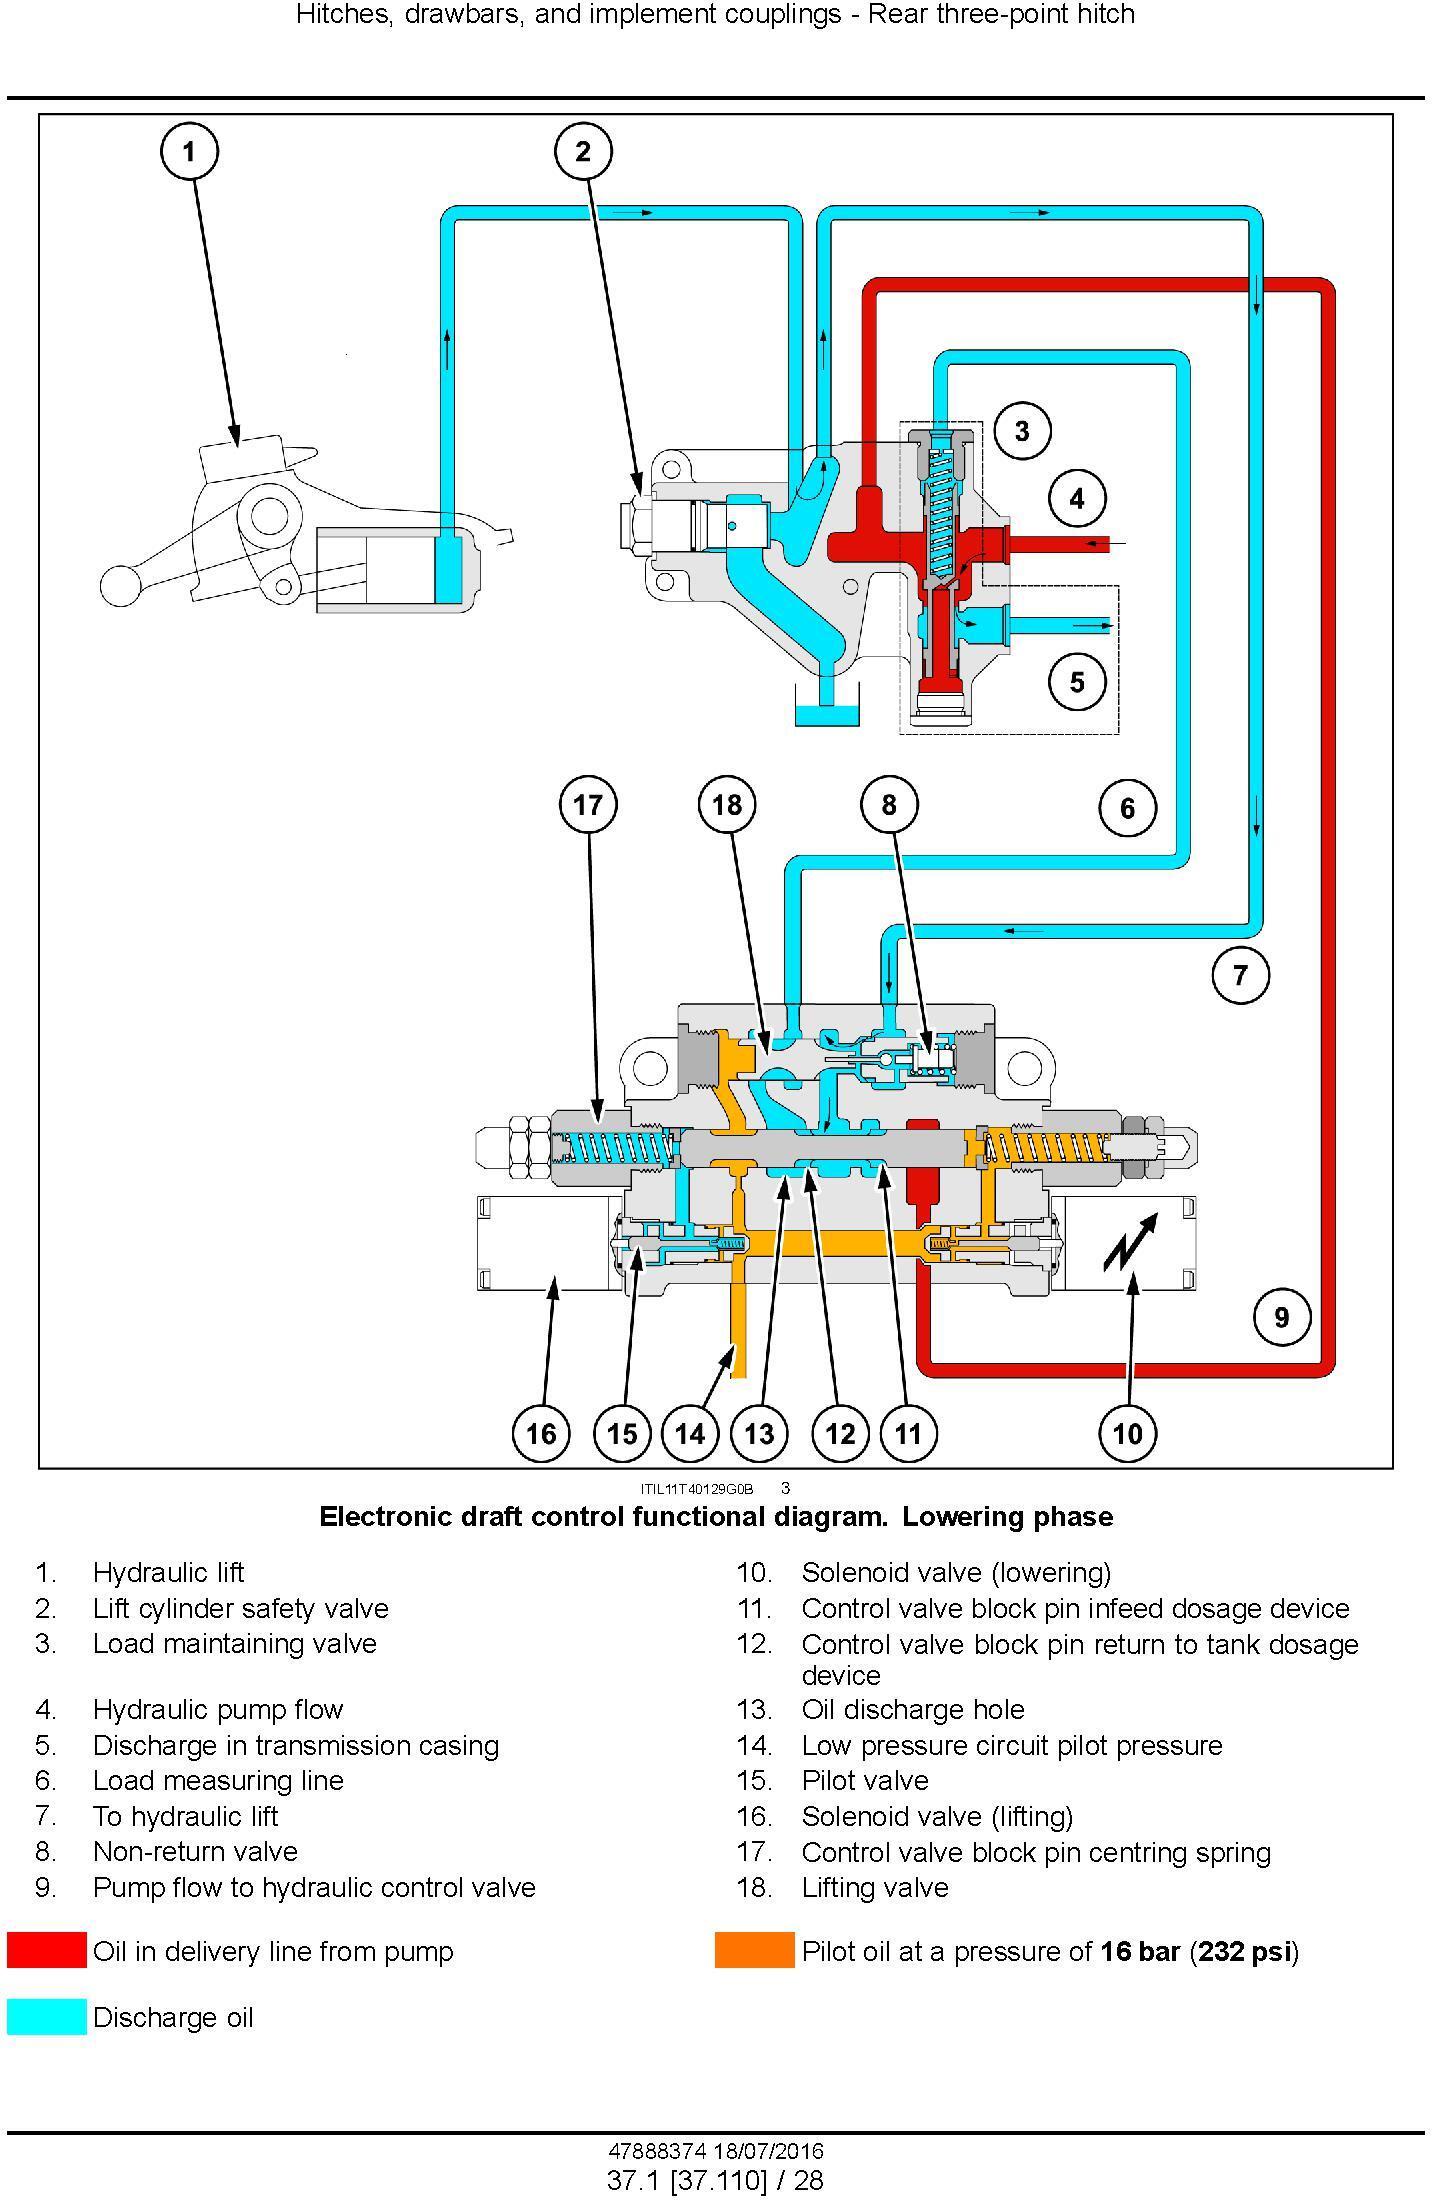 New Holland T4.65V, T4.75V, T4.85V, T4.95V, T4.105V Tractor Service Manual - 2